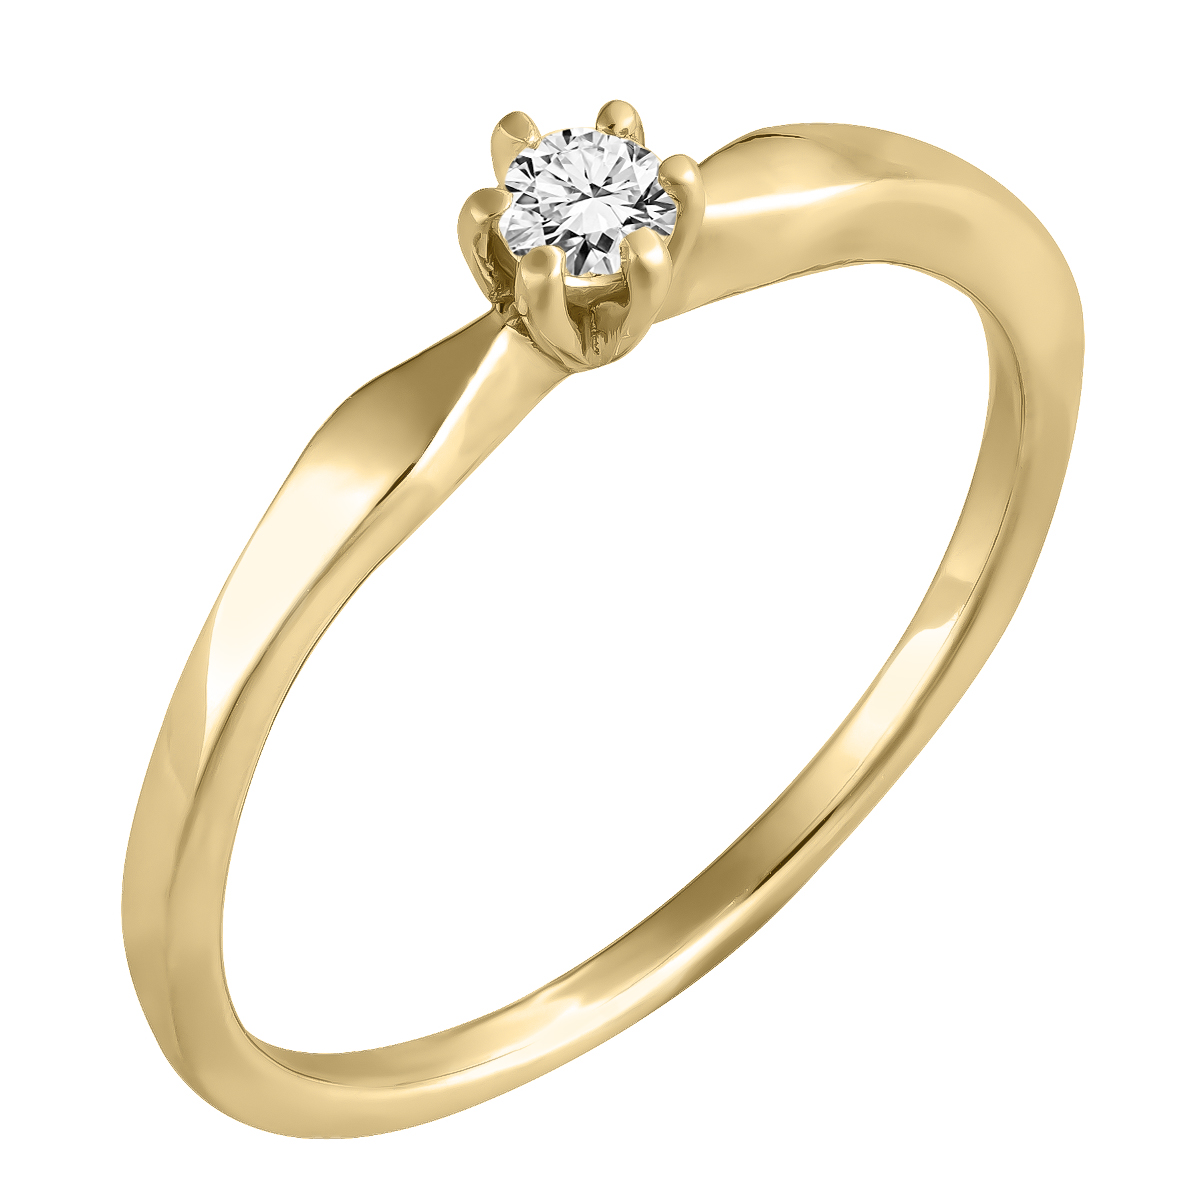 Inel de Logodna Solitaire Dama Aur Galben 14kt cu Diamant Rotund Briliant in 6 Gheare in Stoc-img1